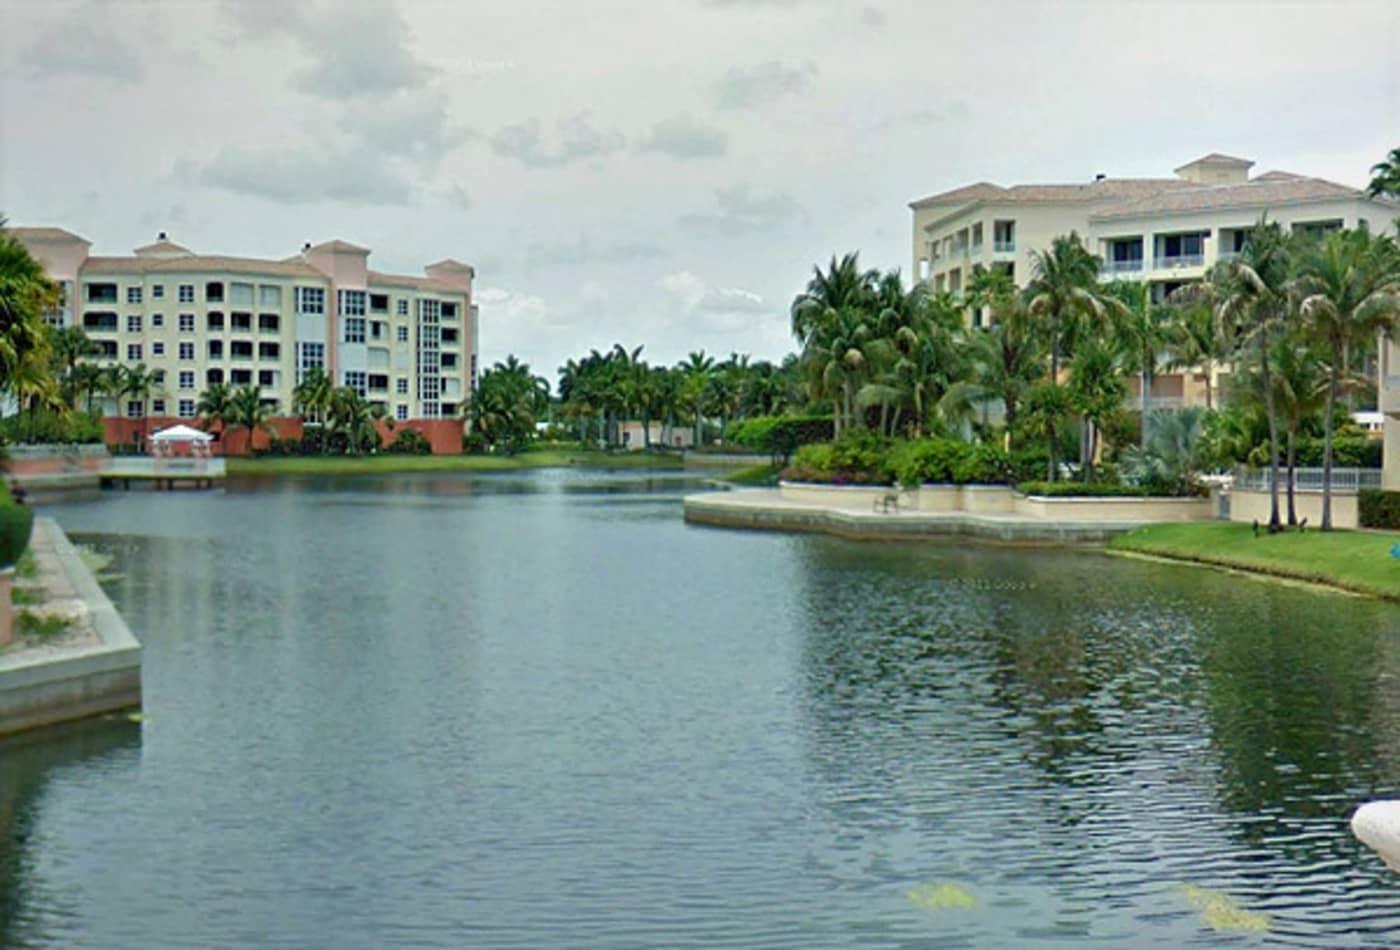 Key-Biscayne-Miami-Best-Kept-Secret-Neighborhoods-CNBC.jpg